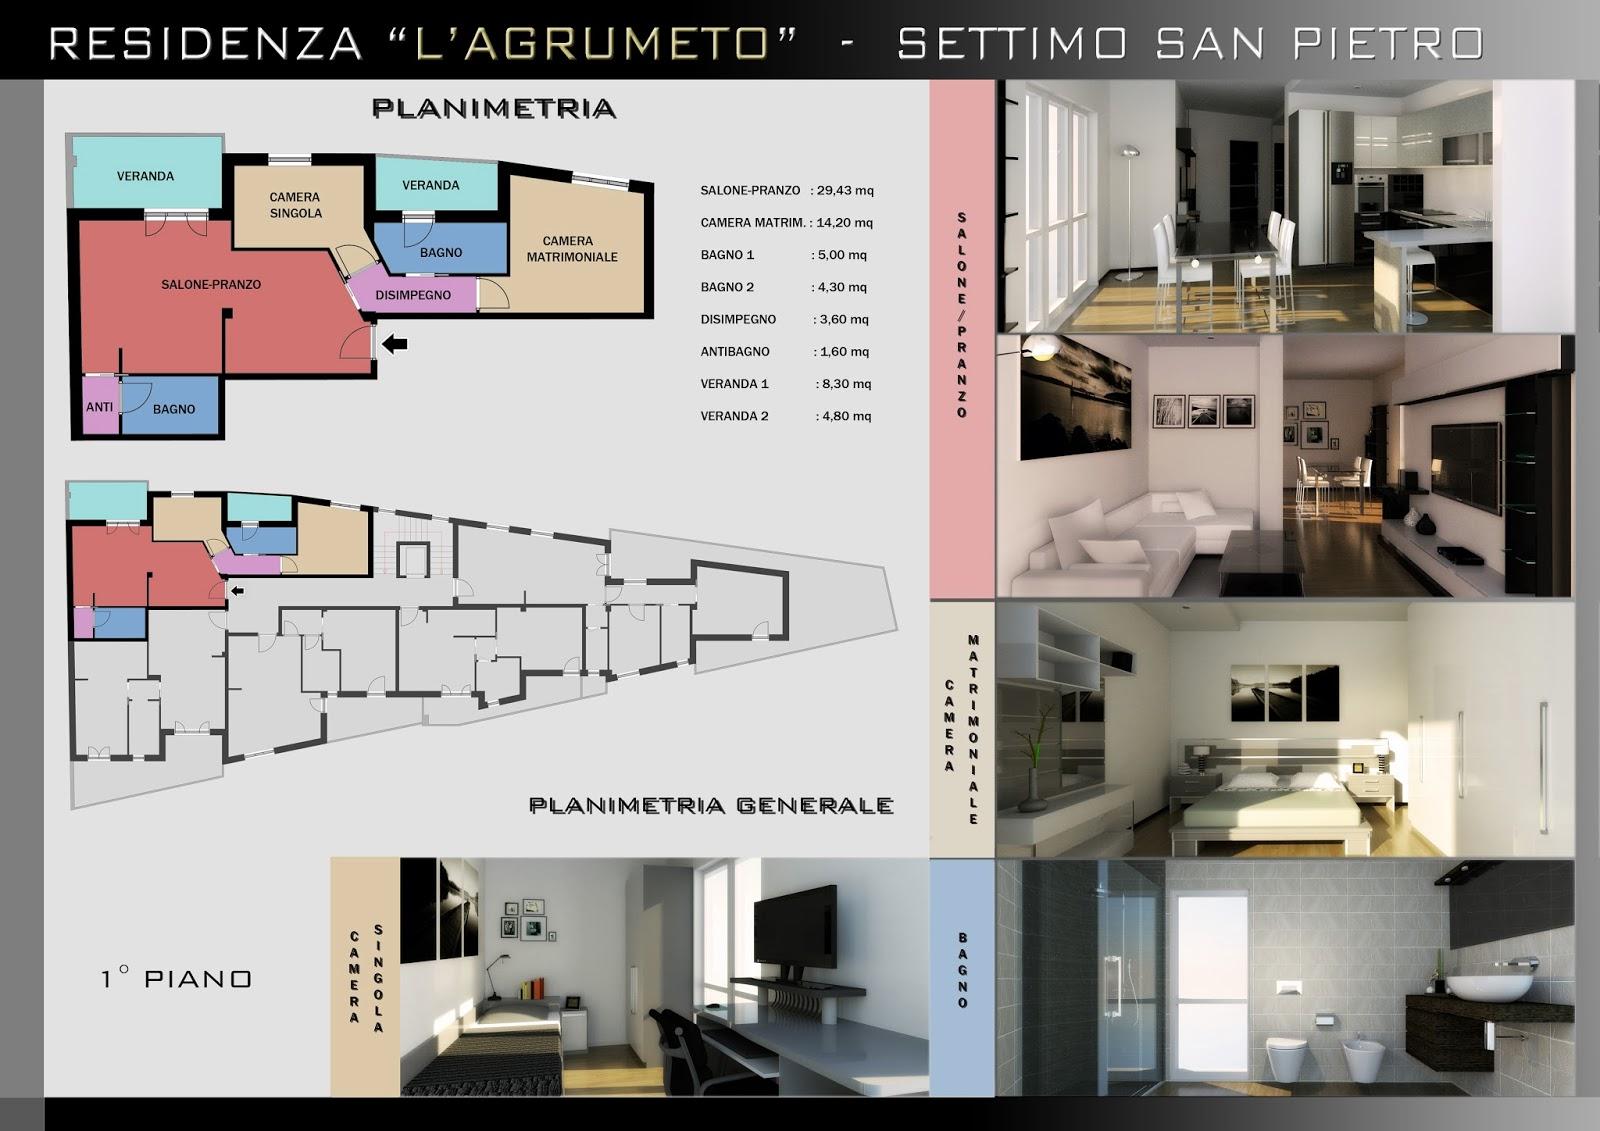 Appartamento 5 B1 Salone Pranzo: 29,43 Mq. Camera Matrim.: 14,20 Mq. Bagno  1: 5,00 Mq. Bagno 2: 4,30 Mq. Disimpegno: 3,60 Mq. Antibagno: 1,60 Mq